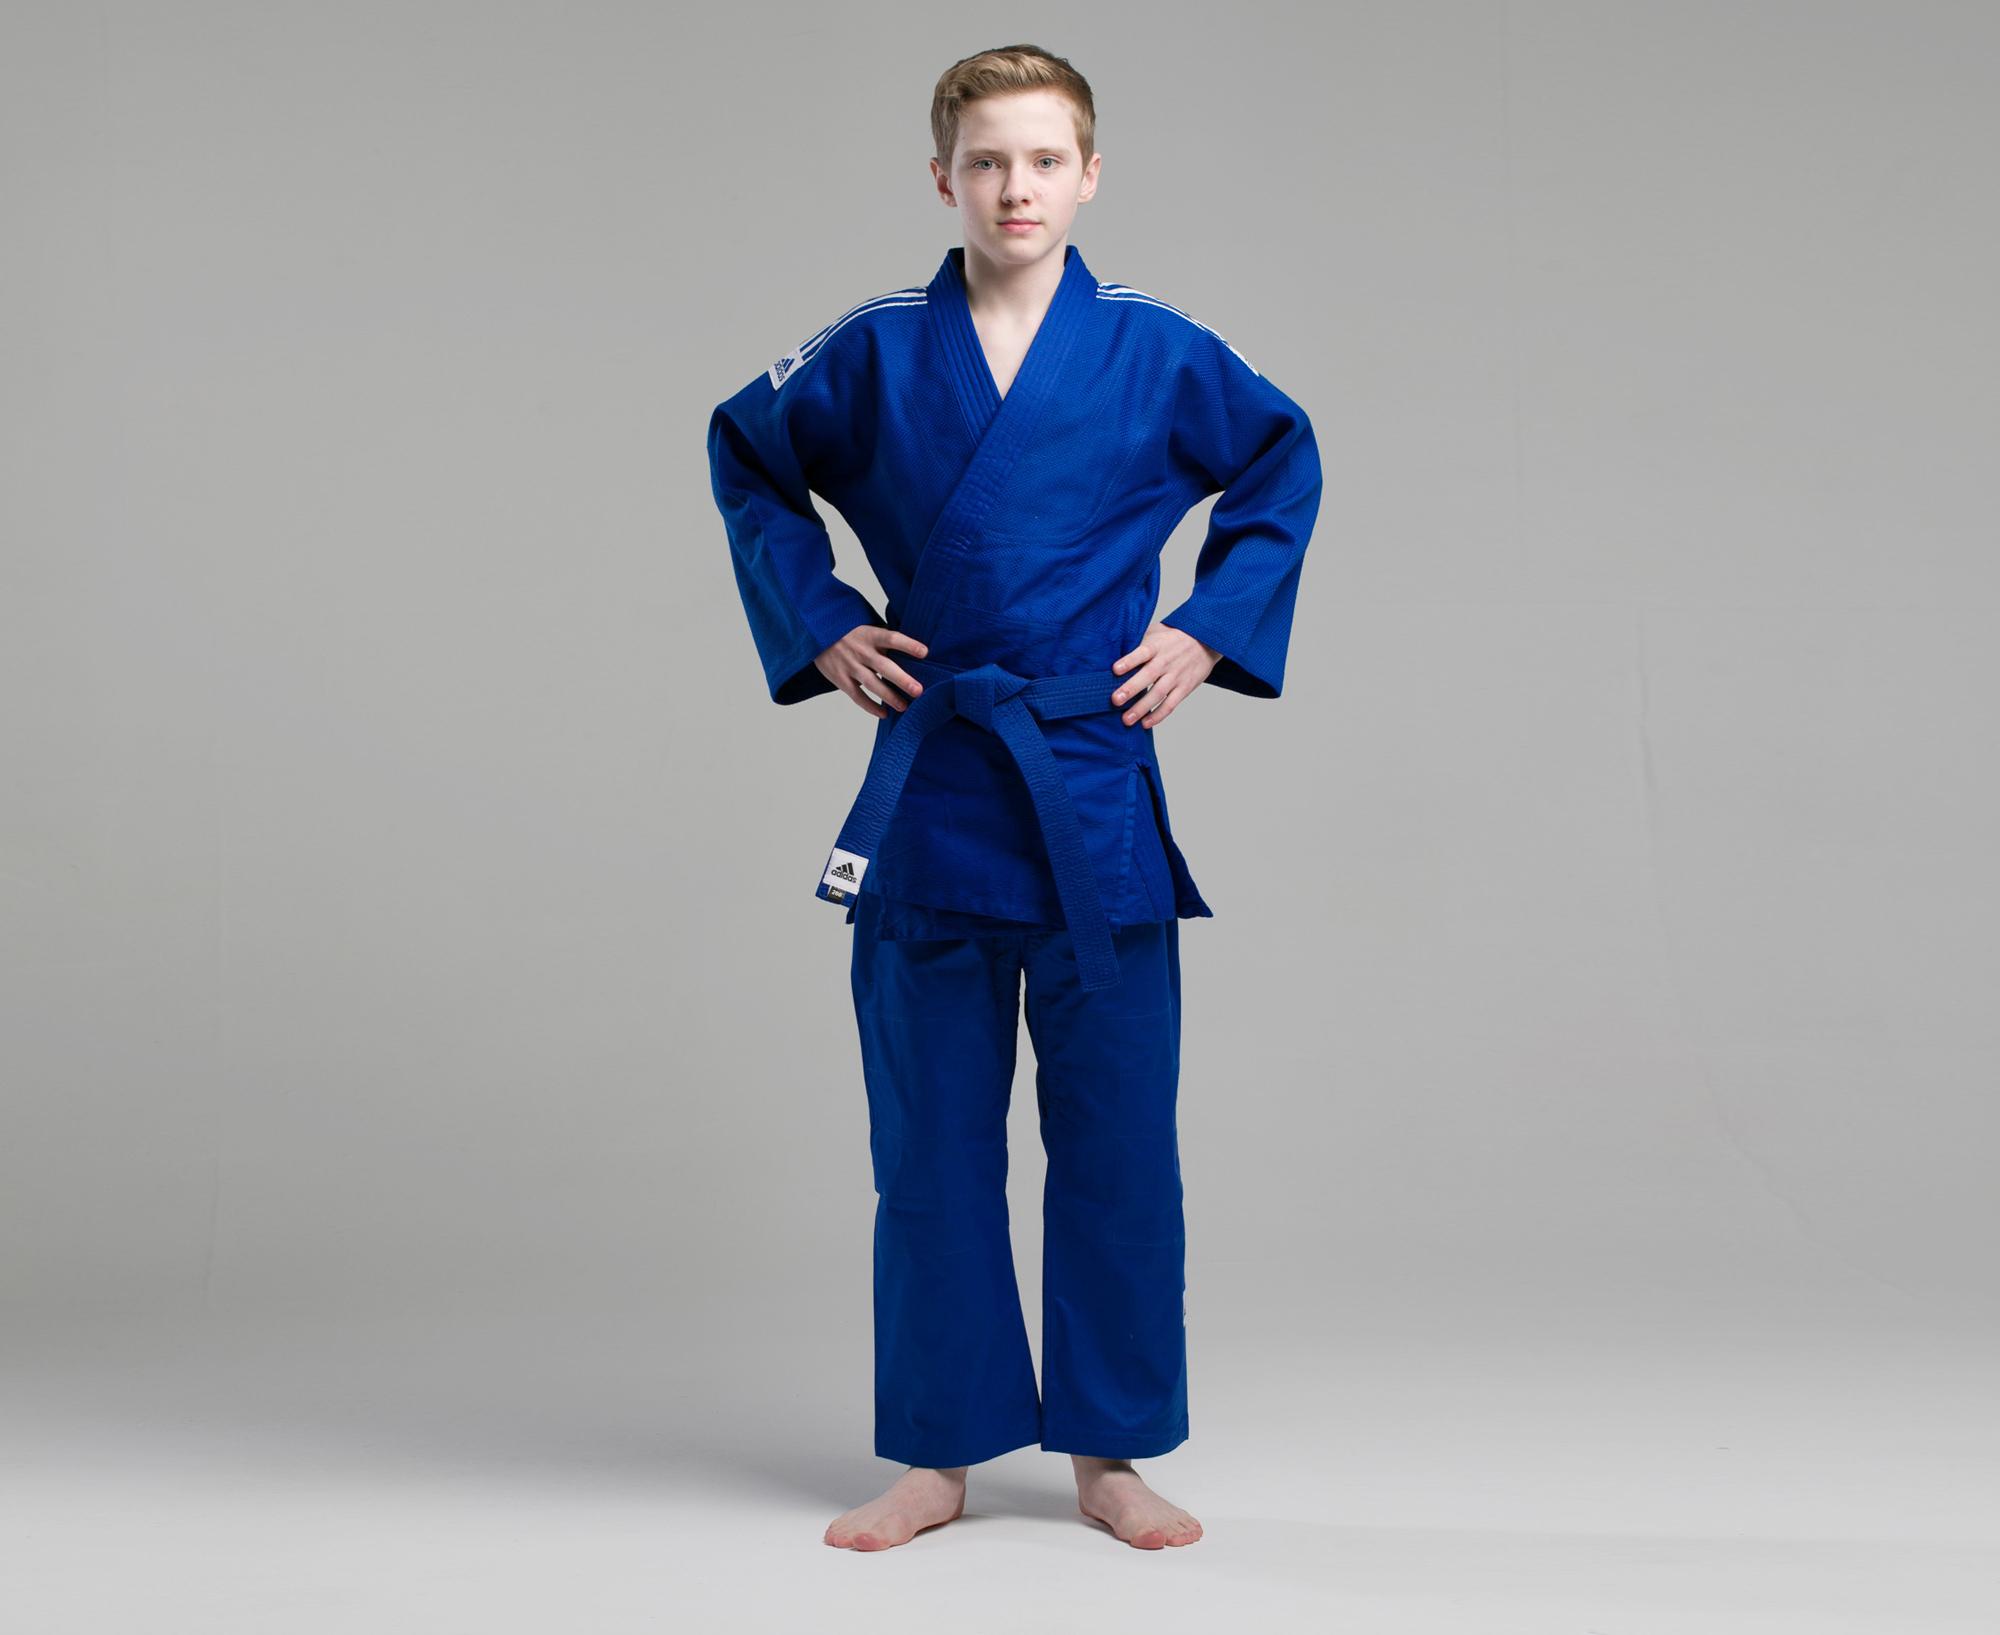 Кимоно и пояса КИМОНО ДЛЯ ДЗЮДО TRAINING СИНЕЕ kimono_dlya_dzyudo_training_sinee.jpg